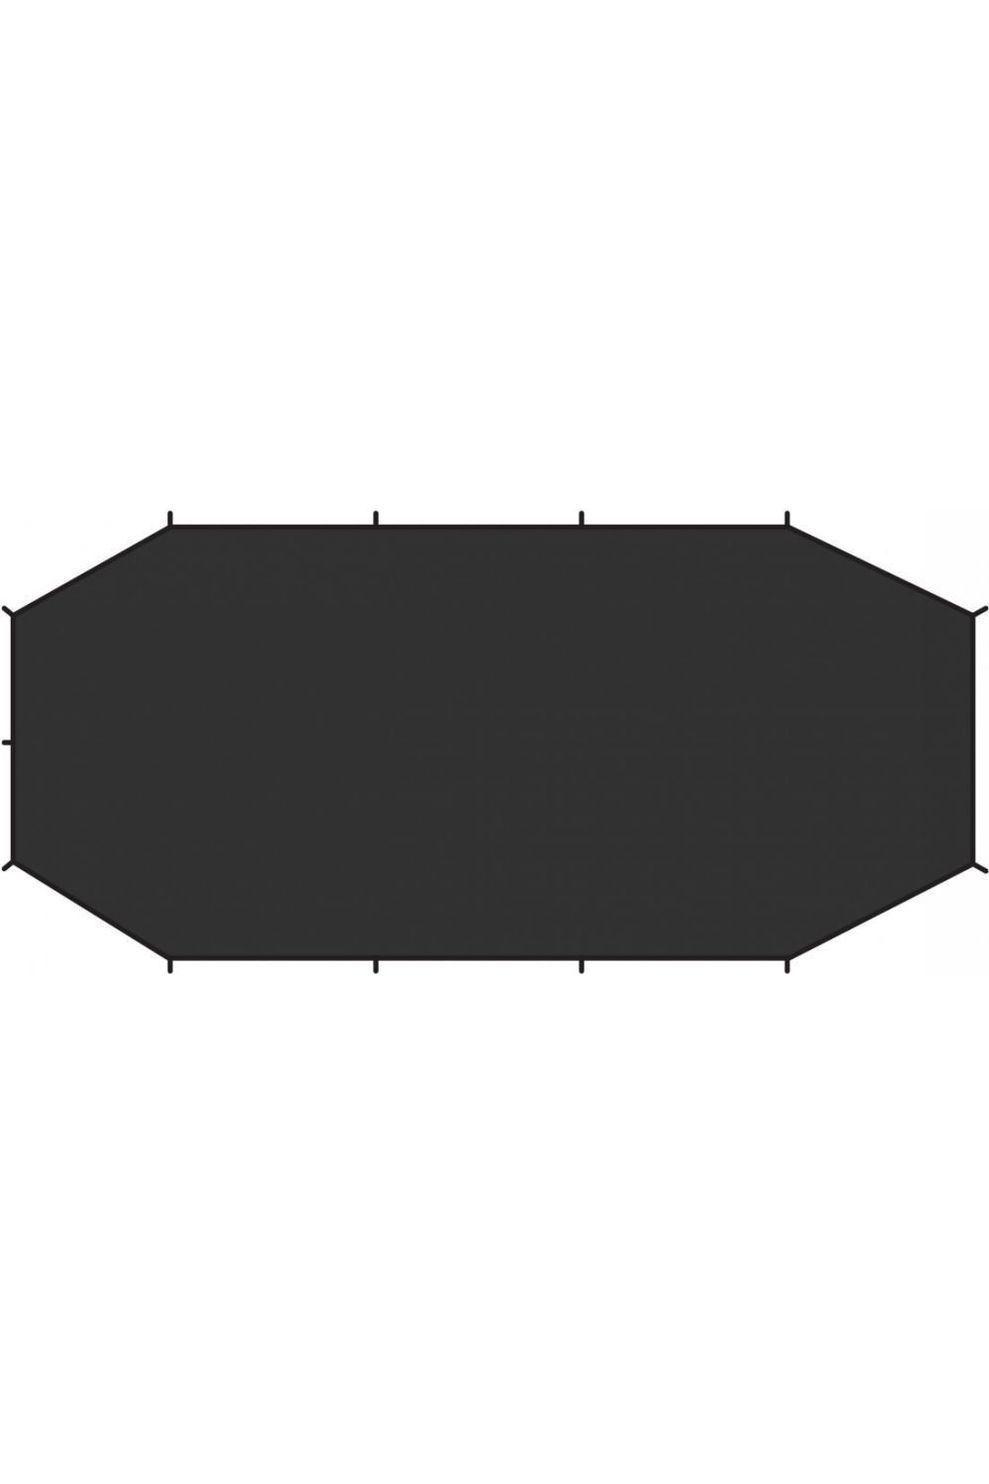 Fjällräven Grondzeil Endurance 4 Footprint - Zwart